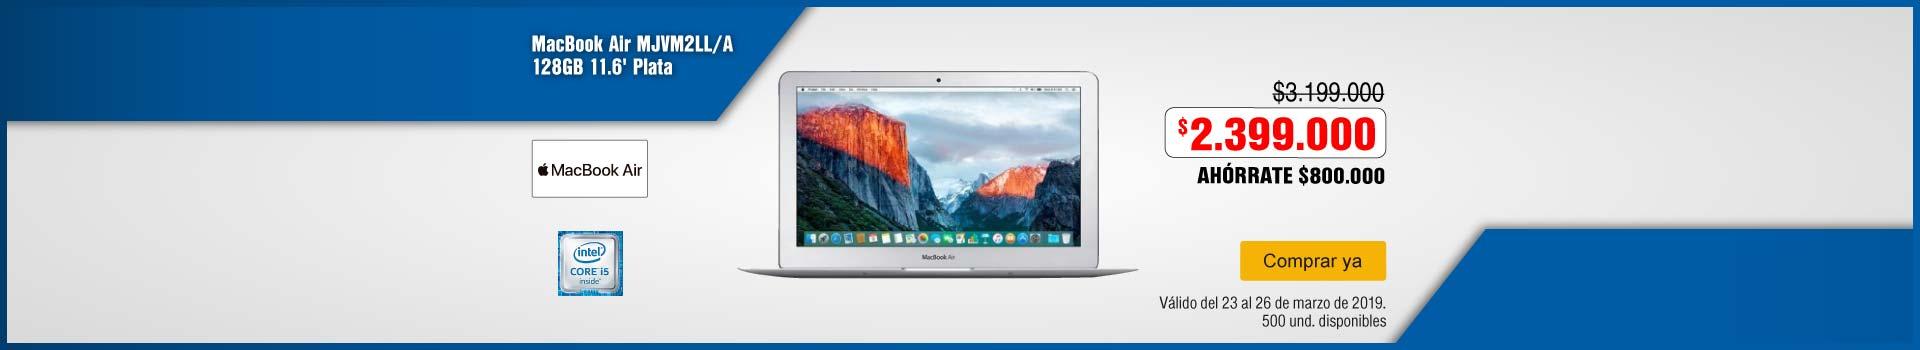 AK-KT-BCAT-1-computadoresytablets-PP-MacBookAir11128GB_marzo22GC